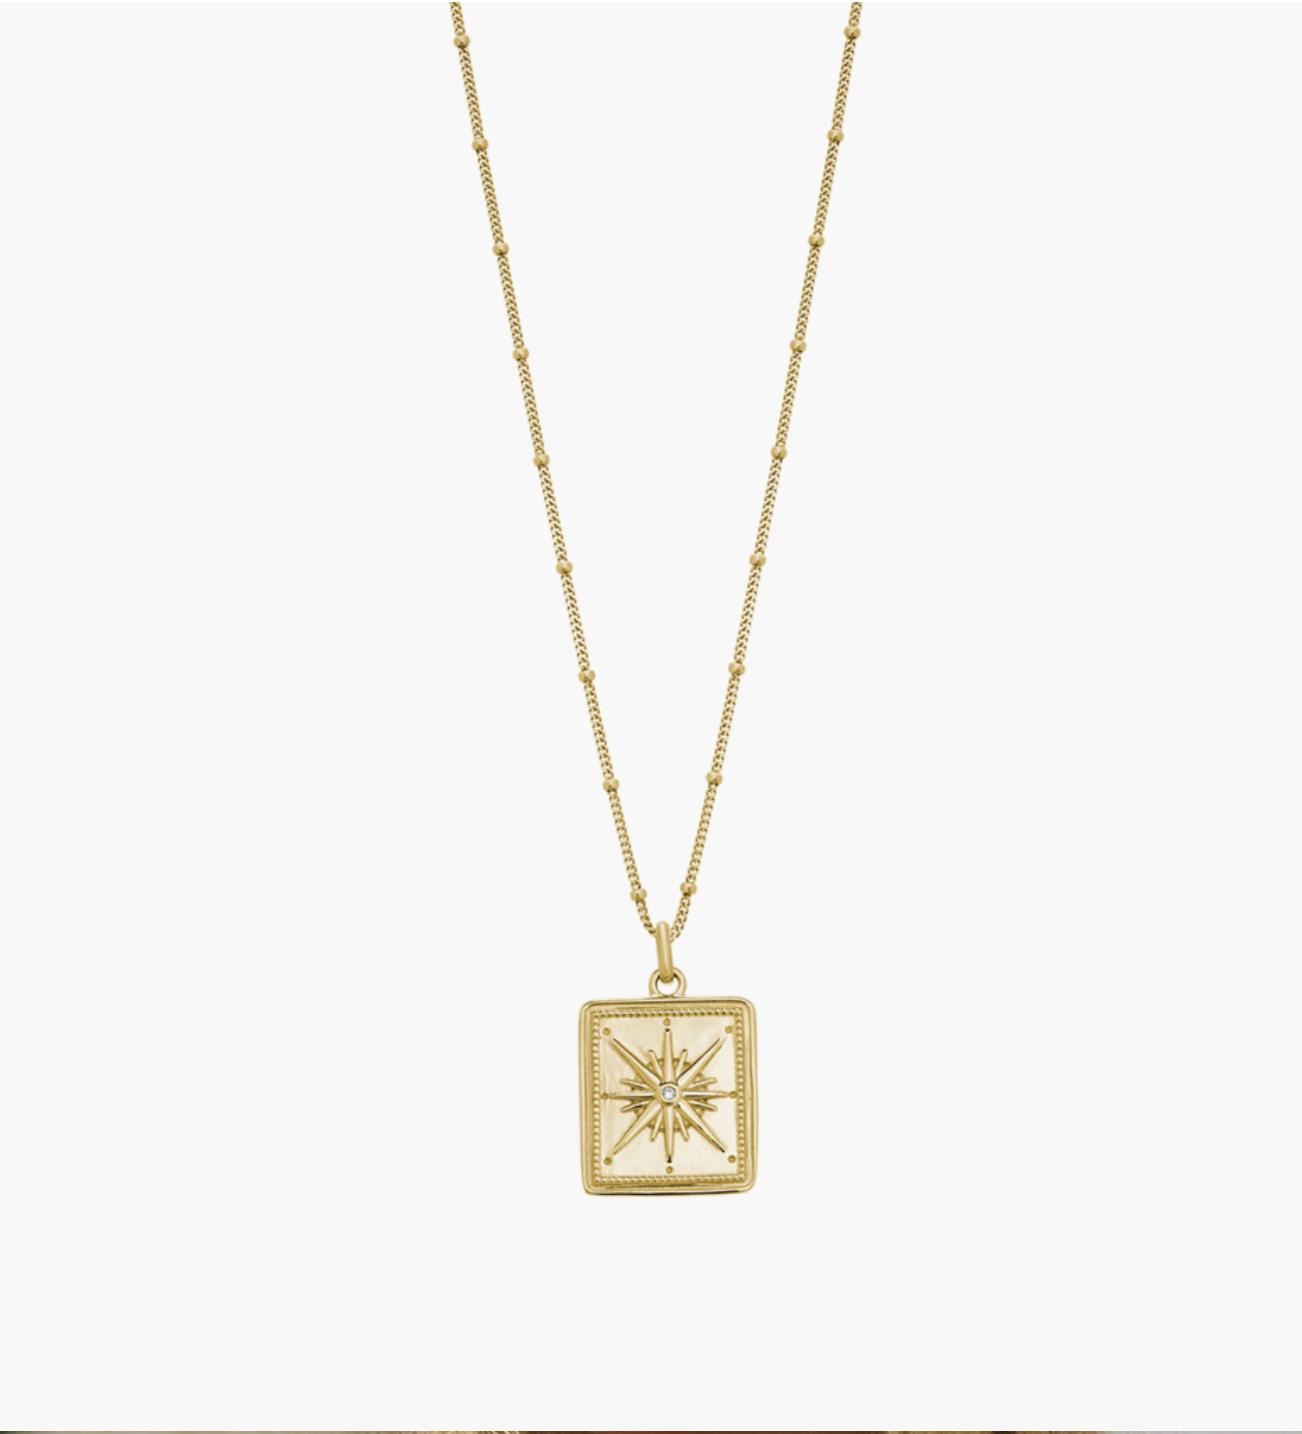 Kirsten Ash True North Coin Necklace